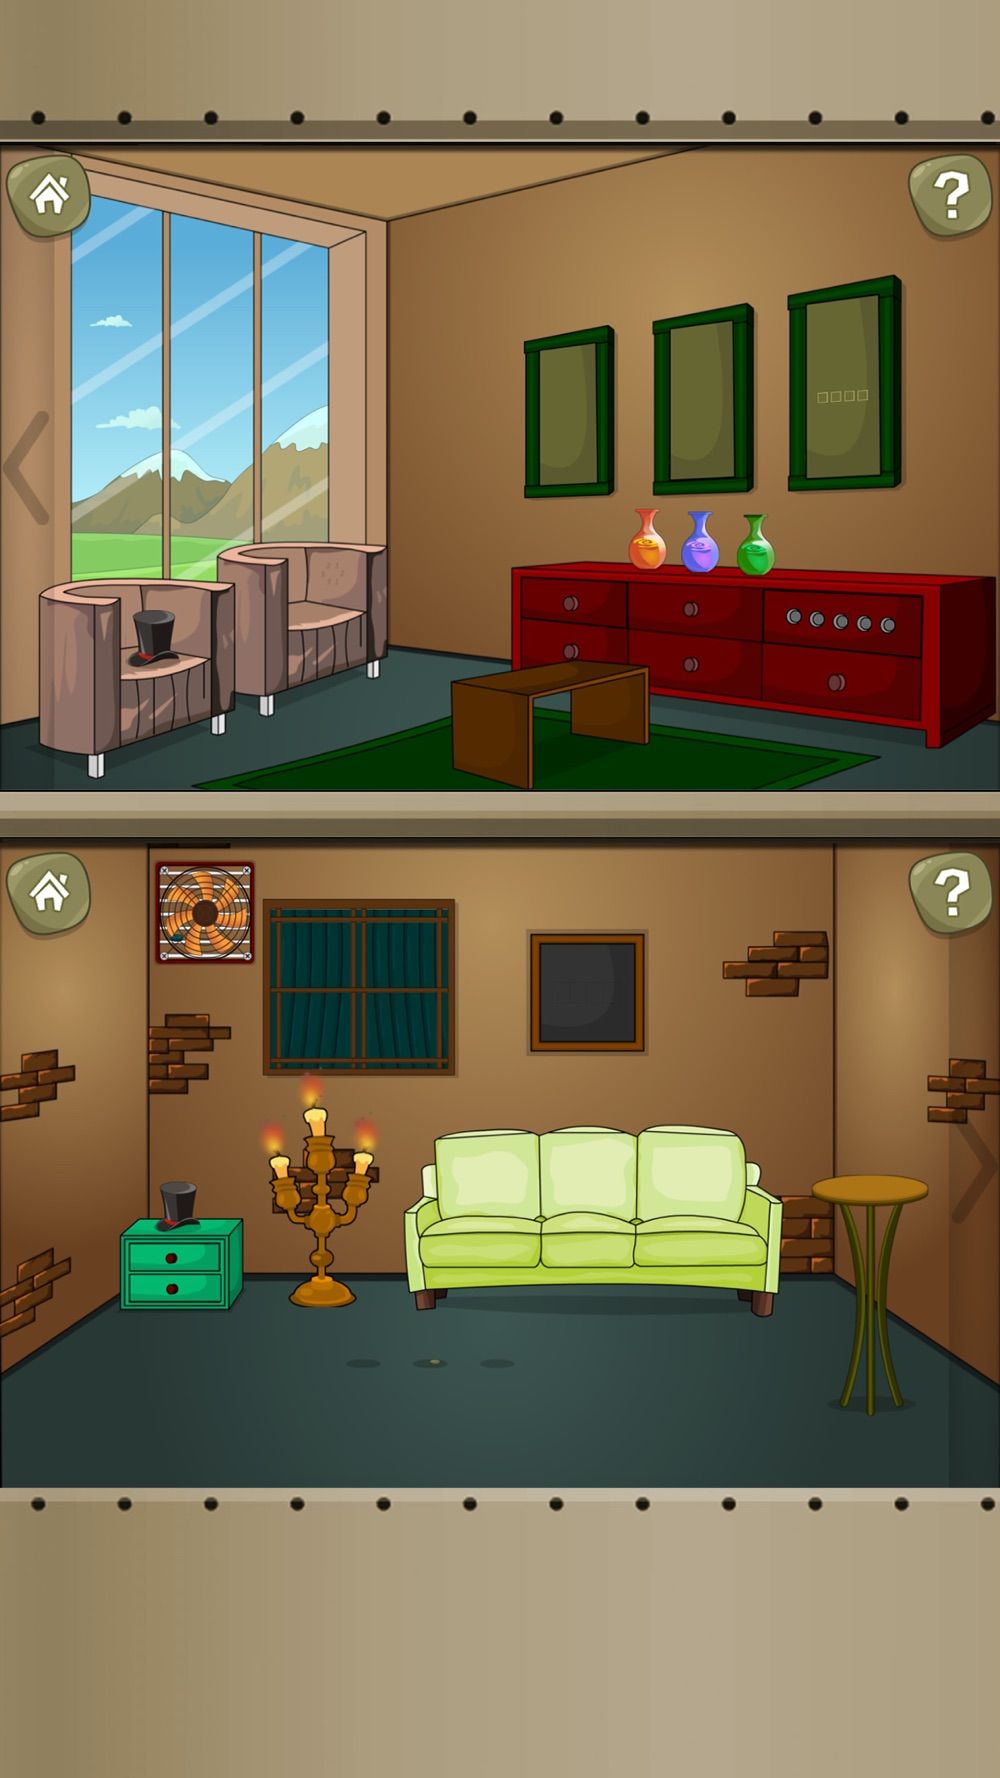 Escape the Room 3:Chamber Escapist Games Cheat Codes